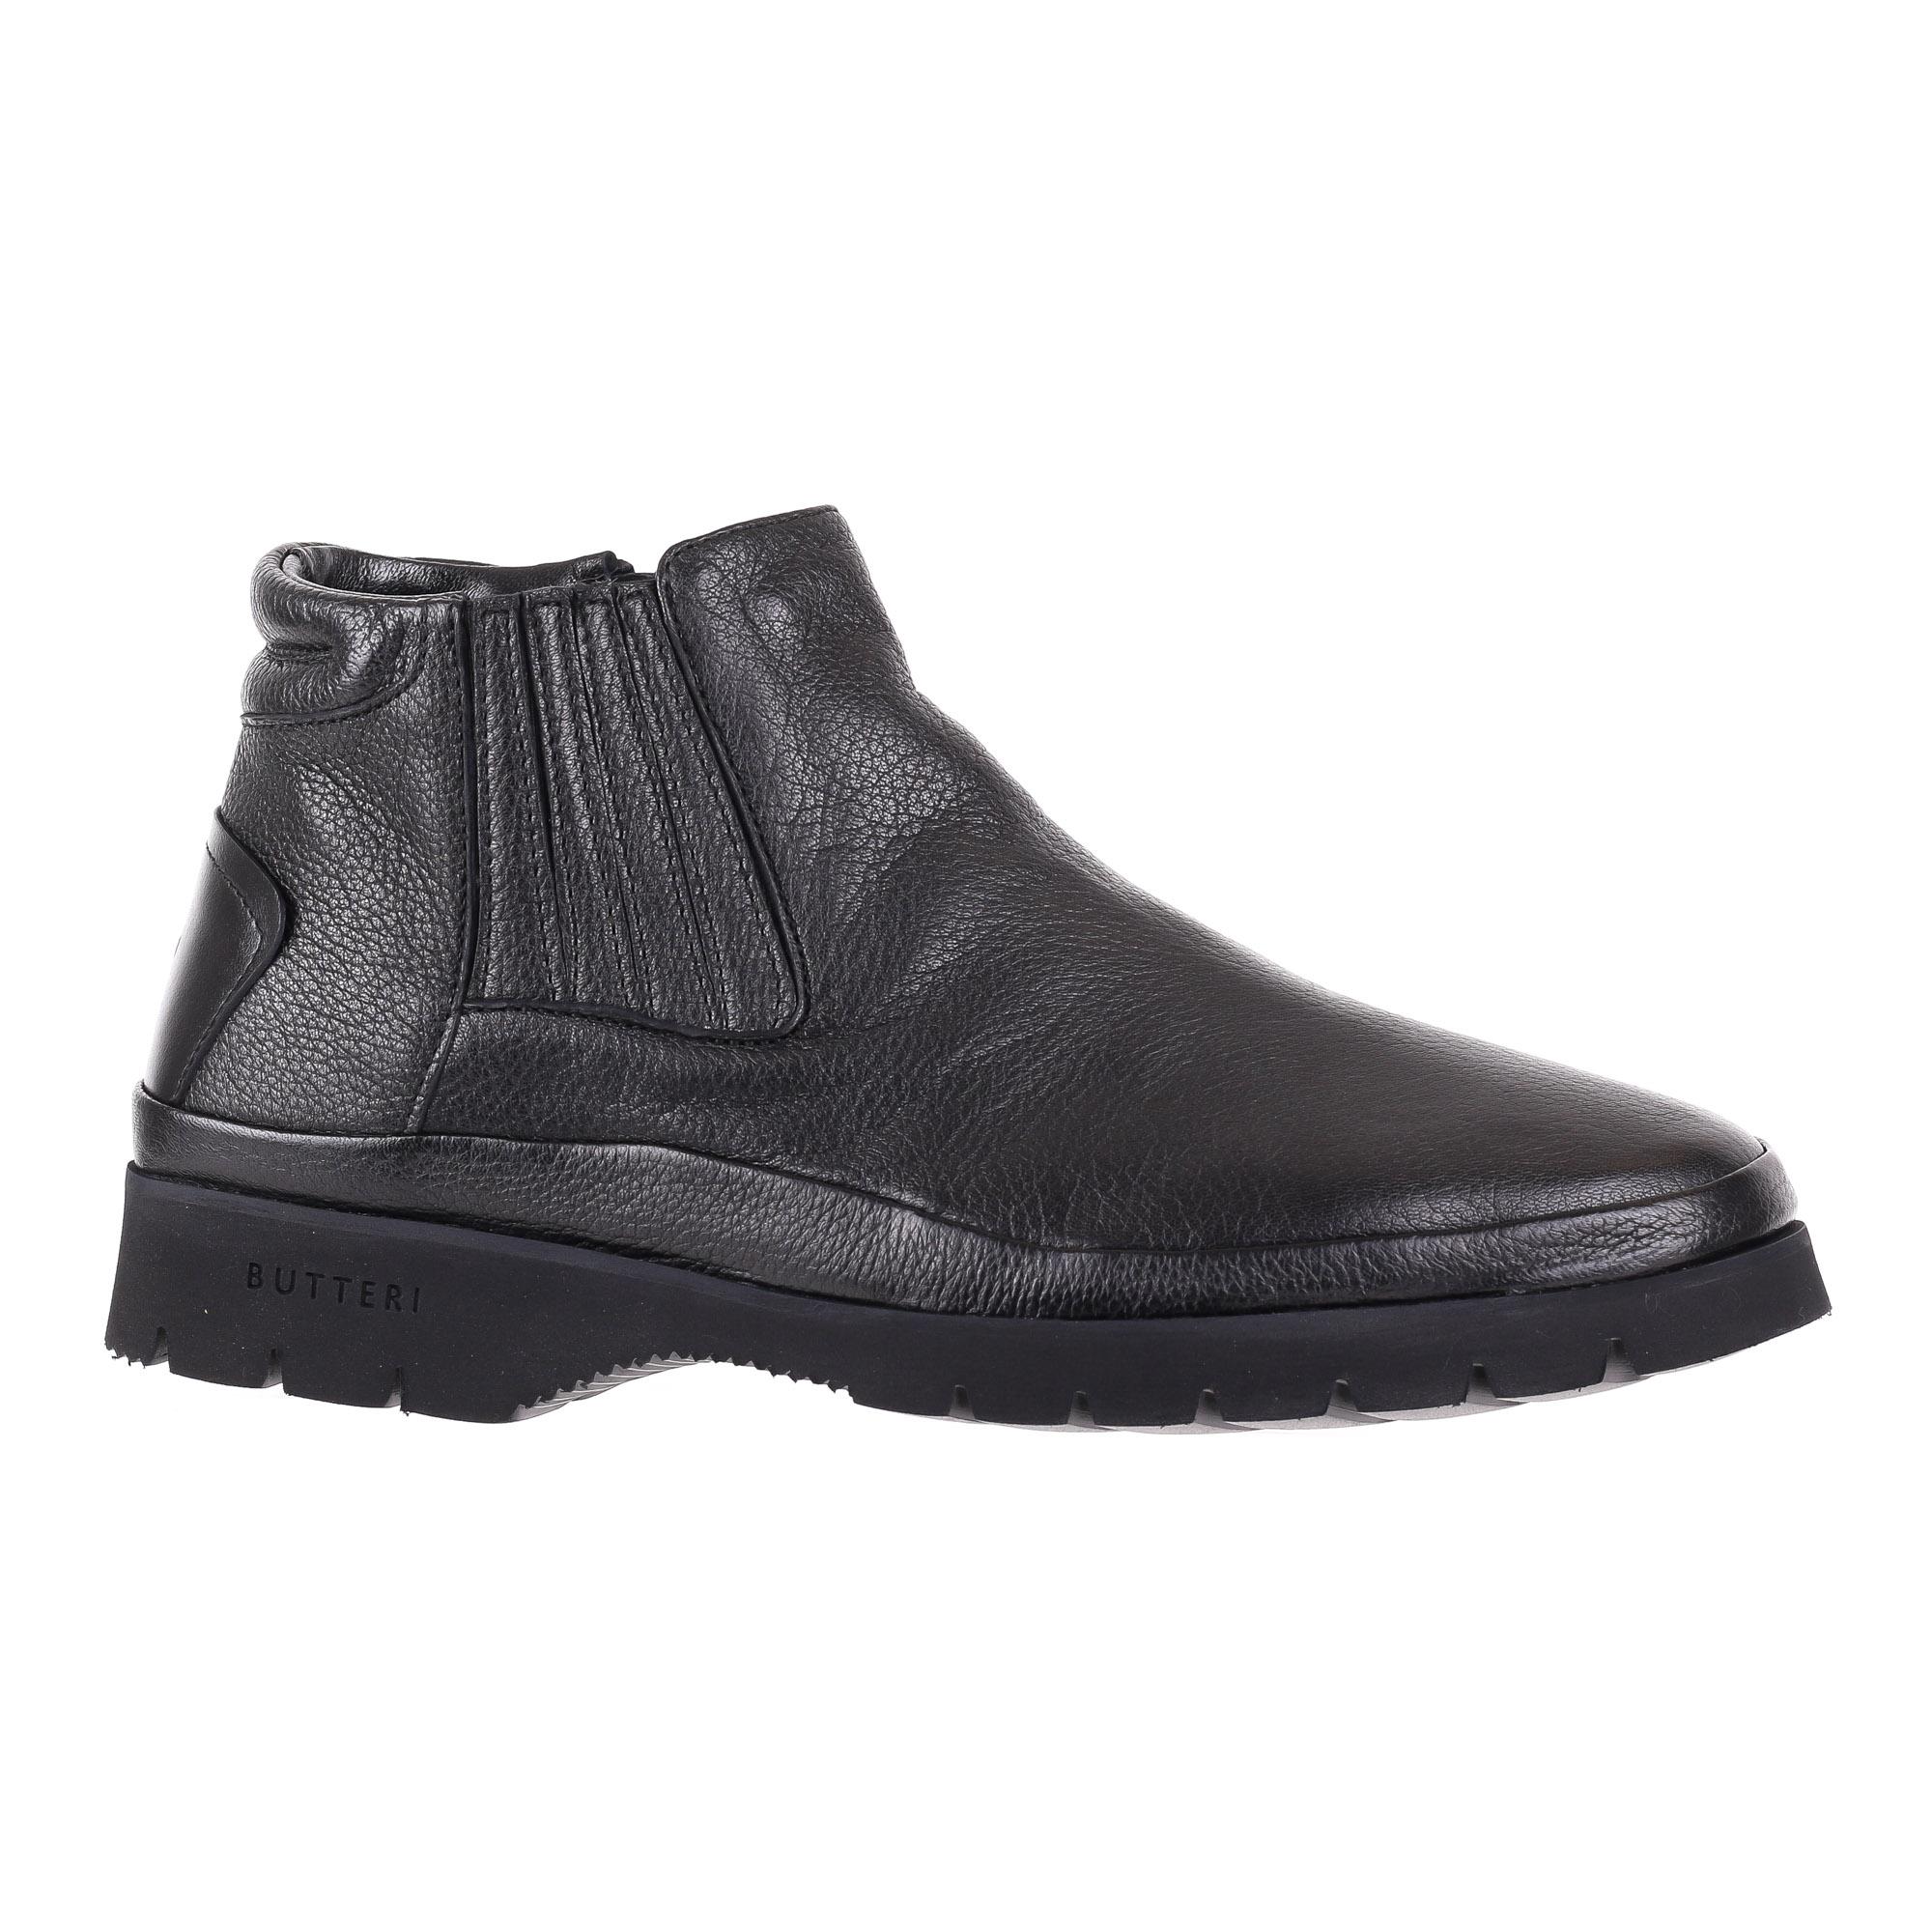 Ботинки Gianfranco Butteri V1239